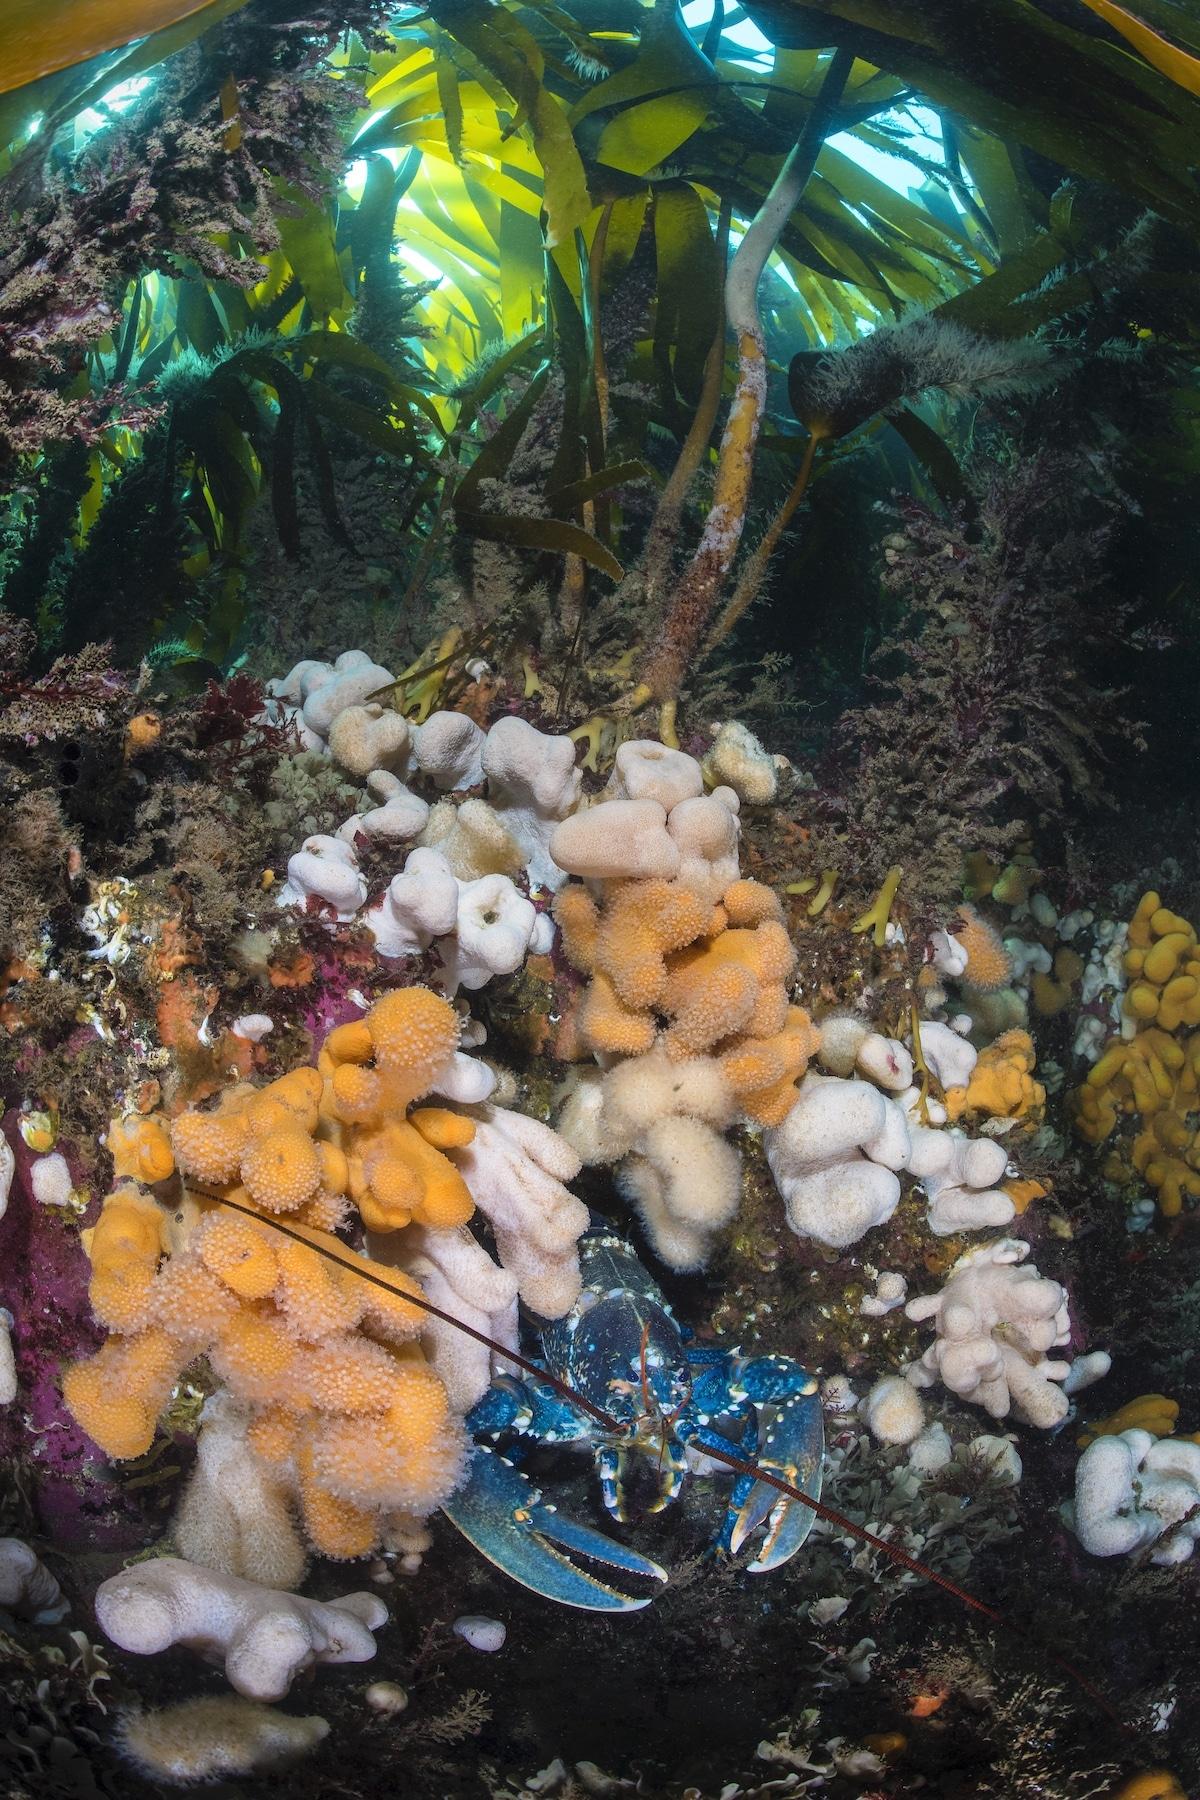 Blue Lobster Emerging from Kelp